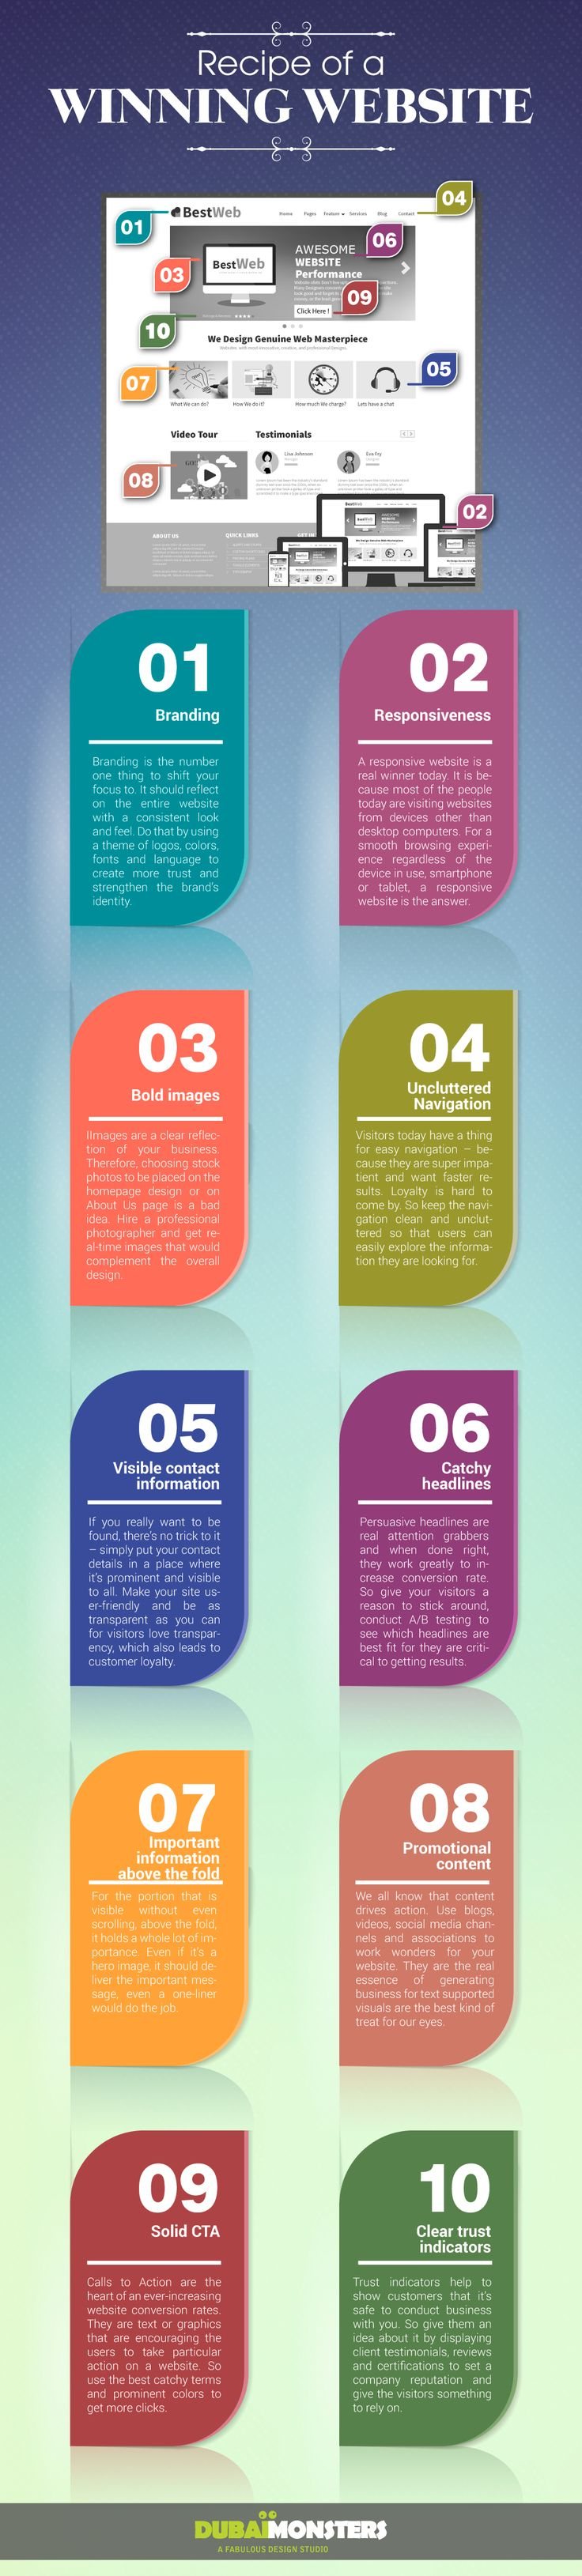 Recipe of a Winning Website #Infographic #Website #Web